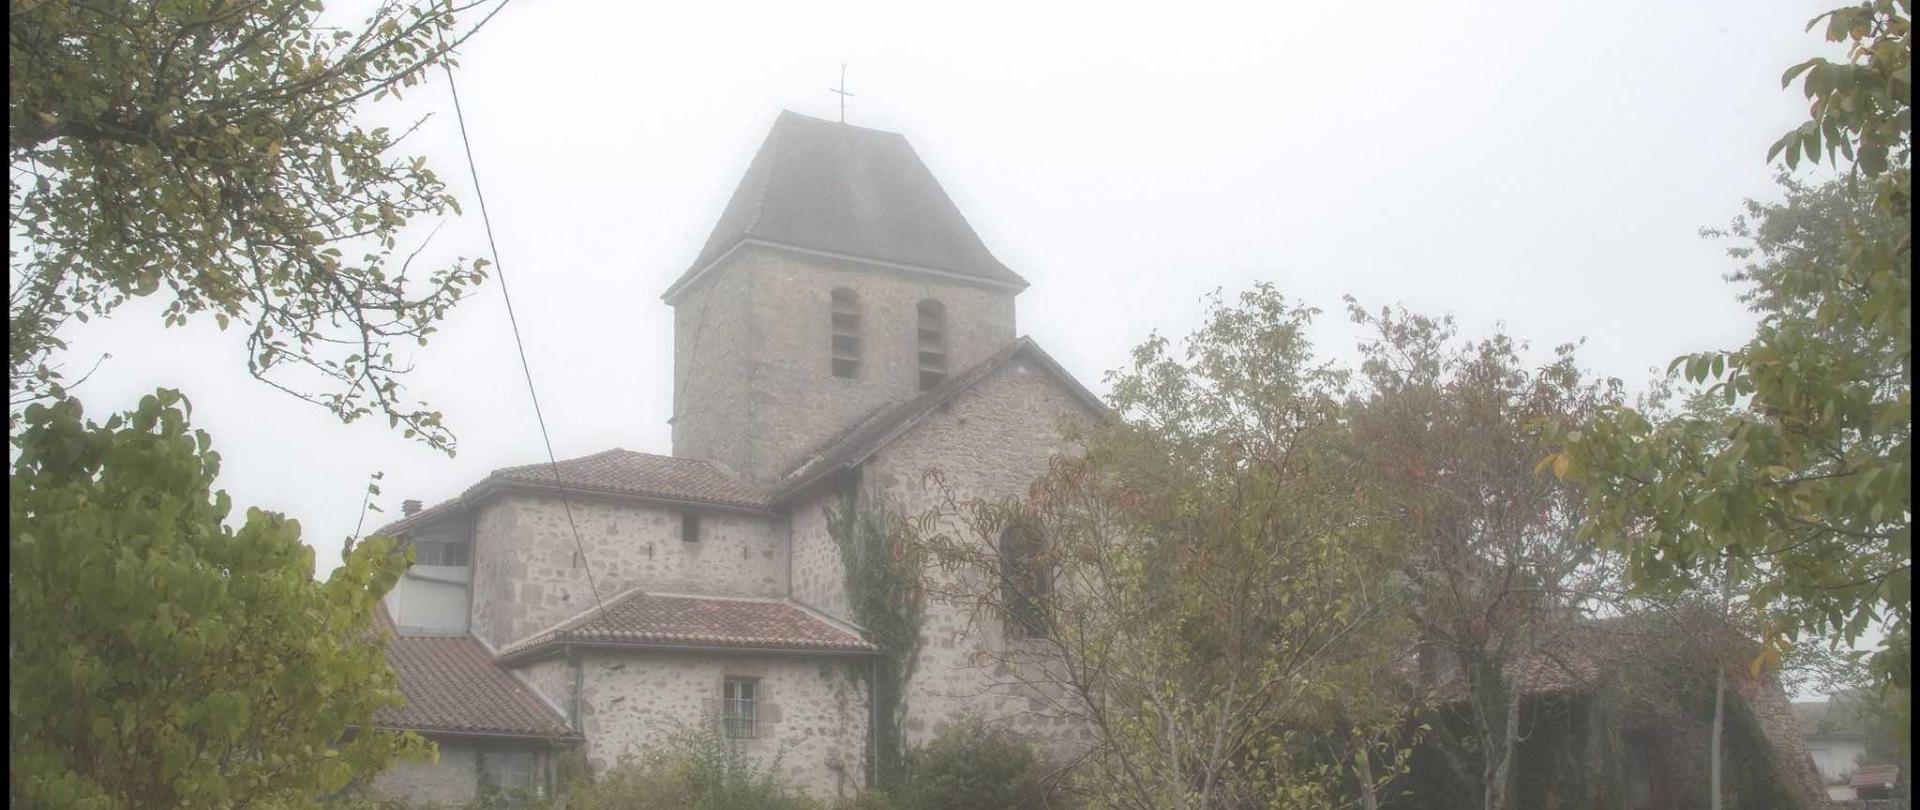 eglise-de-saint-saud-dans-la-brume-chantal_30141676035_o.jpg